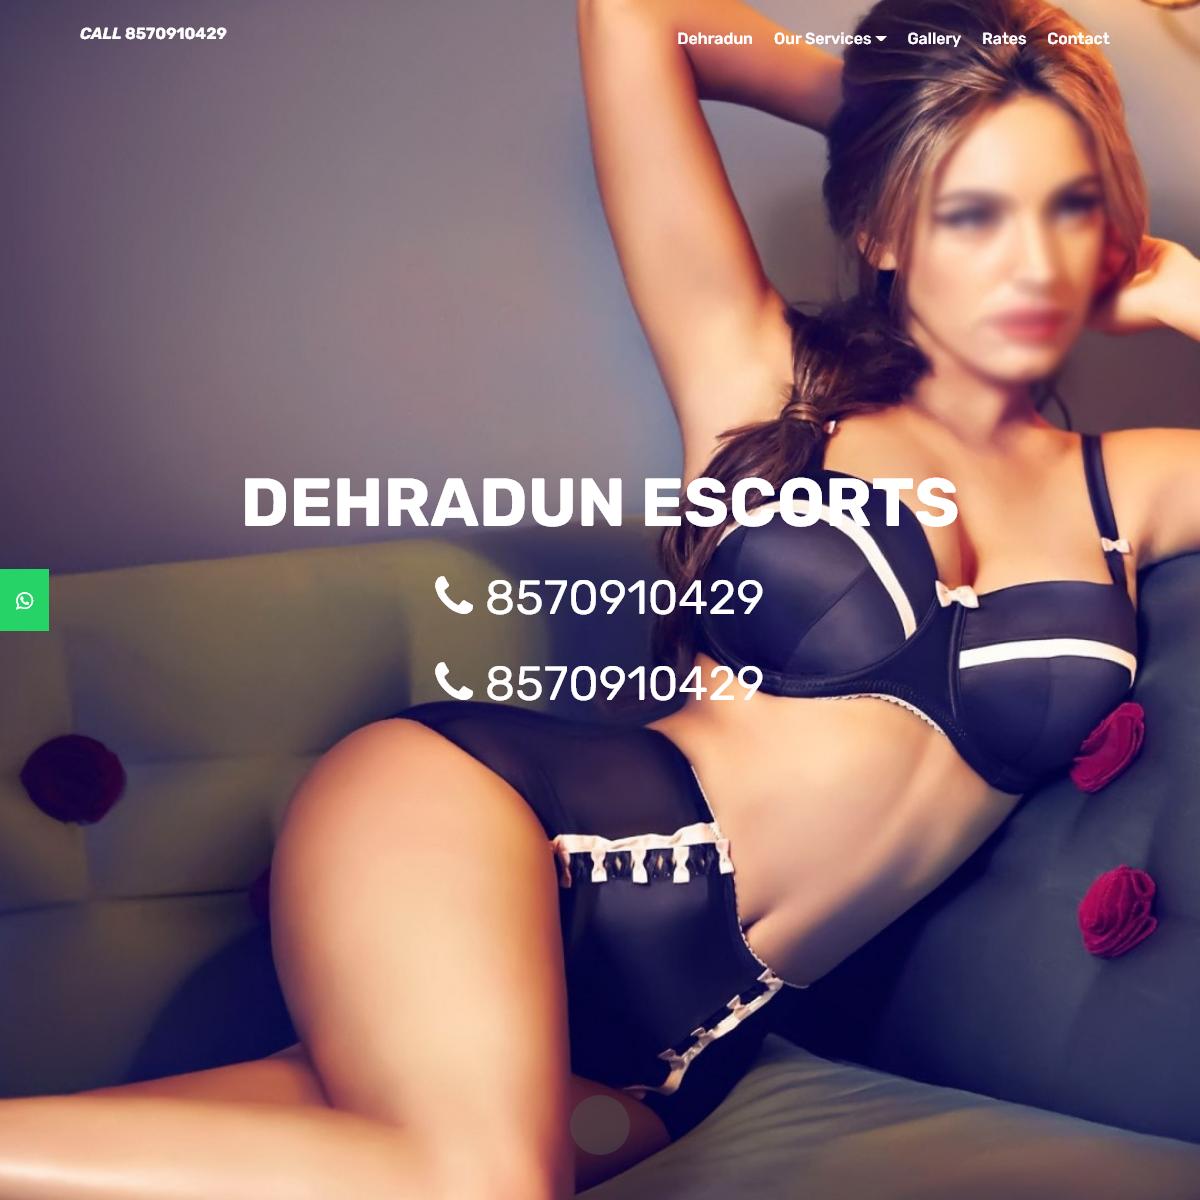 Dehradun Escorts Service - 8570910429 - Call Girls in Dehradun